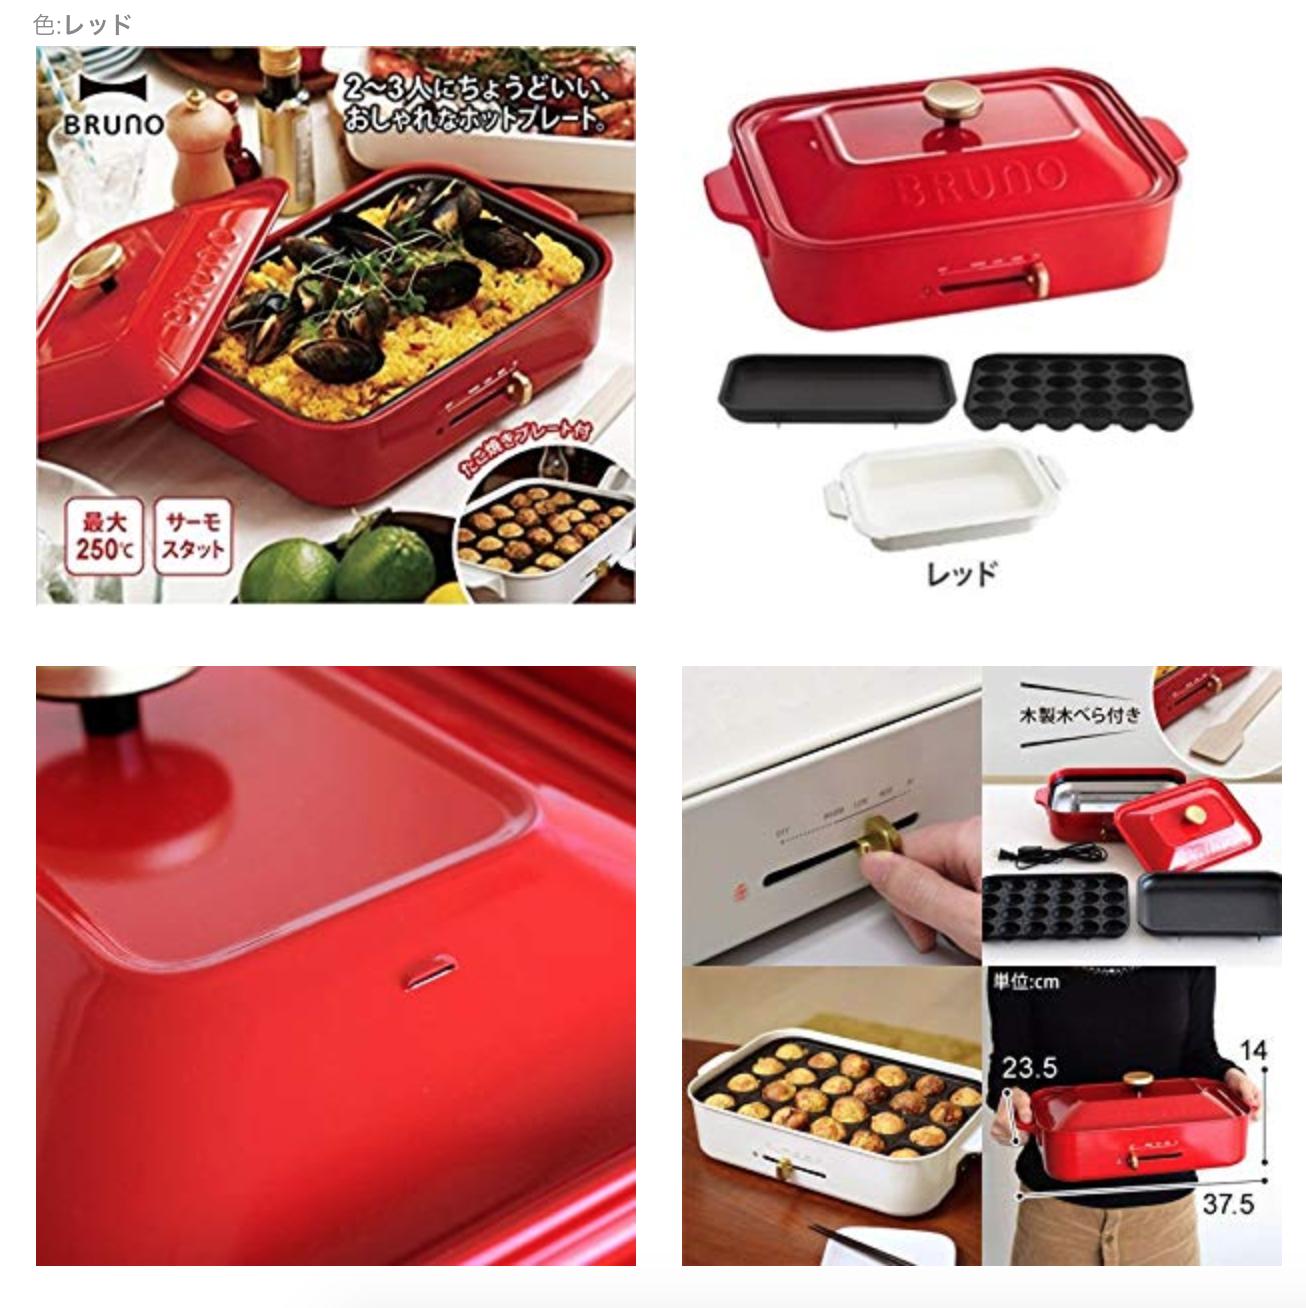 BRUNO多功能電烤盤,日本amazon購物網